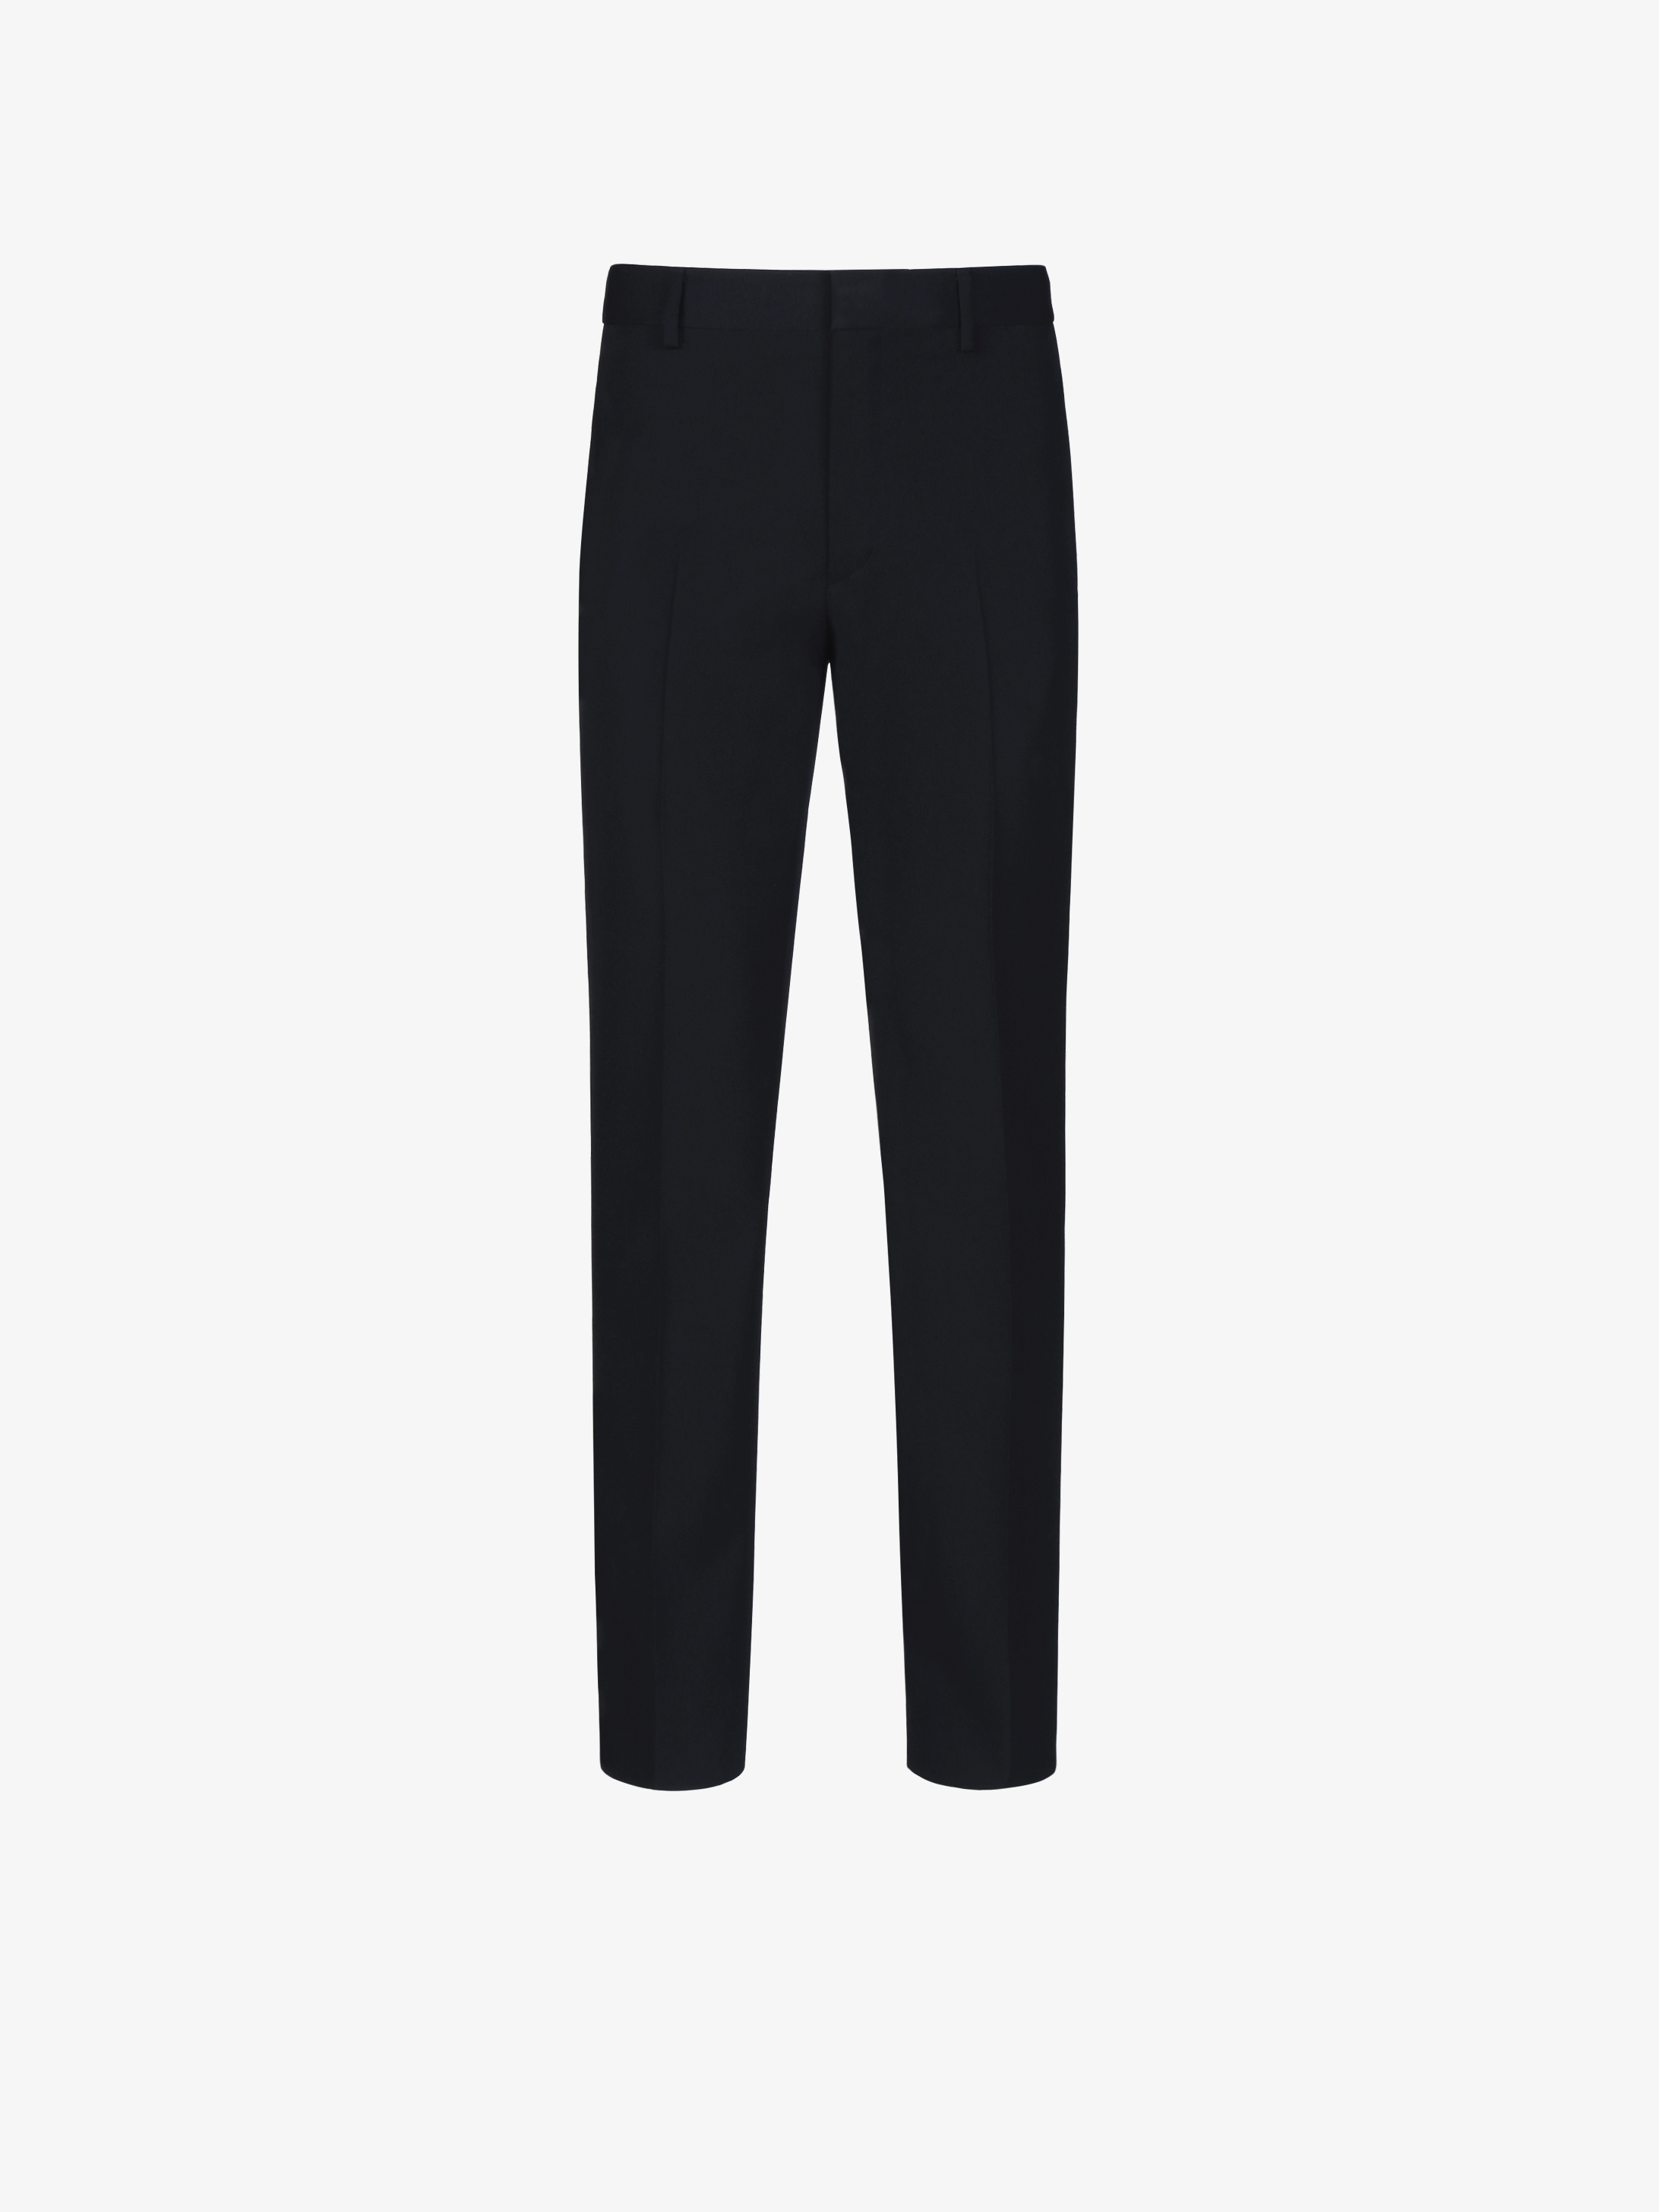 Extraslim fit tuxedo pants in wool